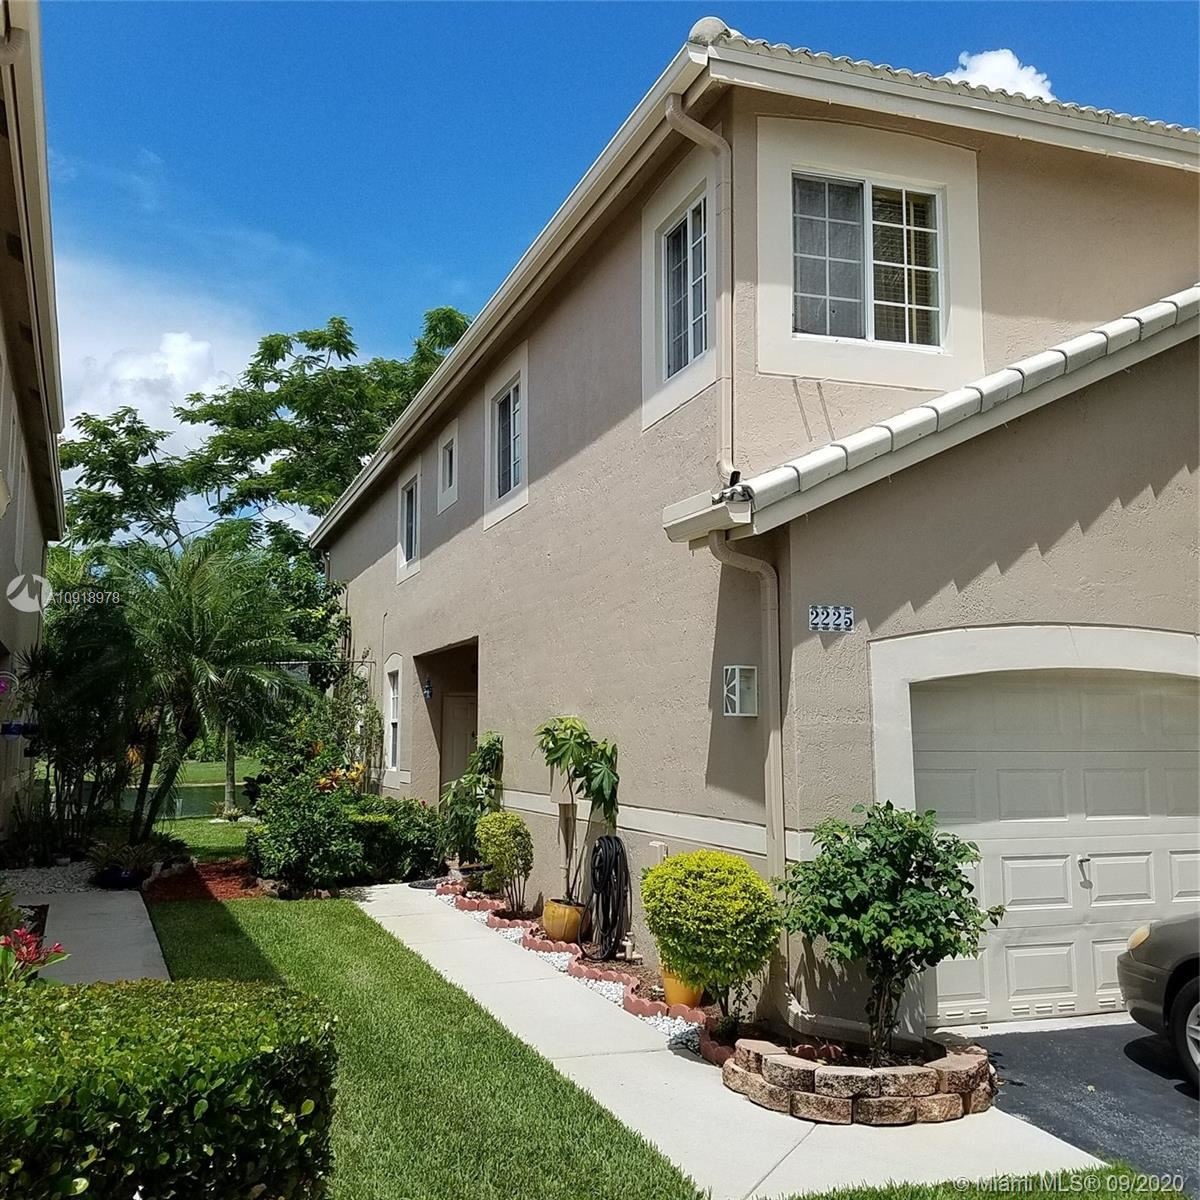 2225 Salerno Cir, Weston, FL 33327 - #: A10918978